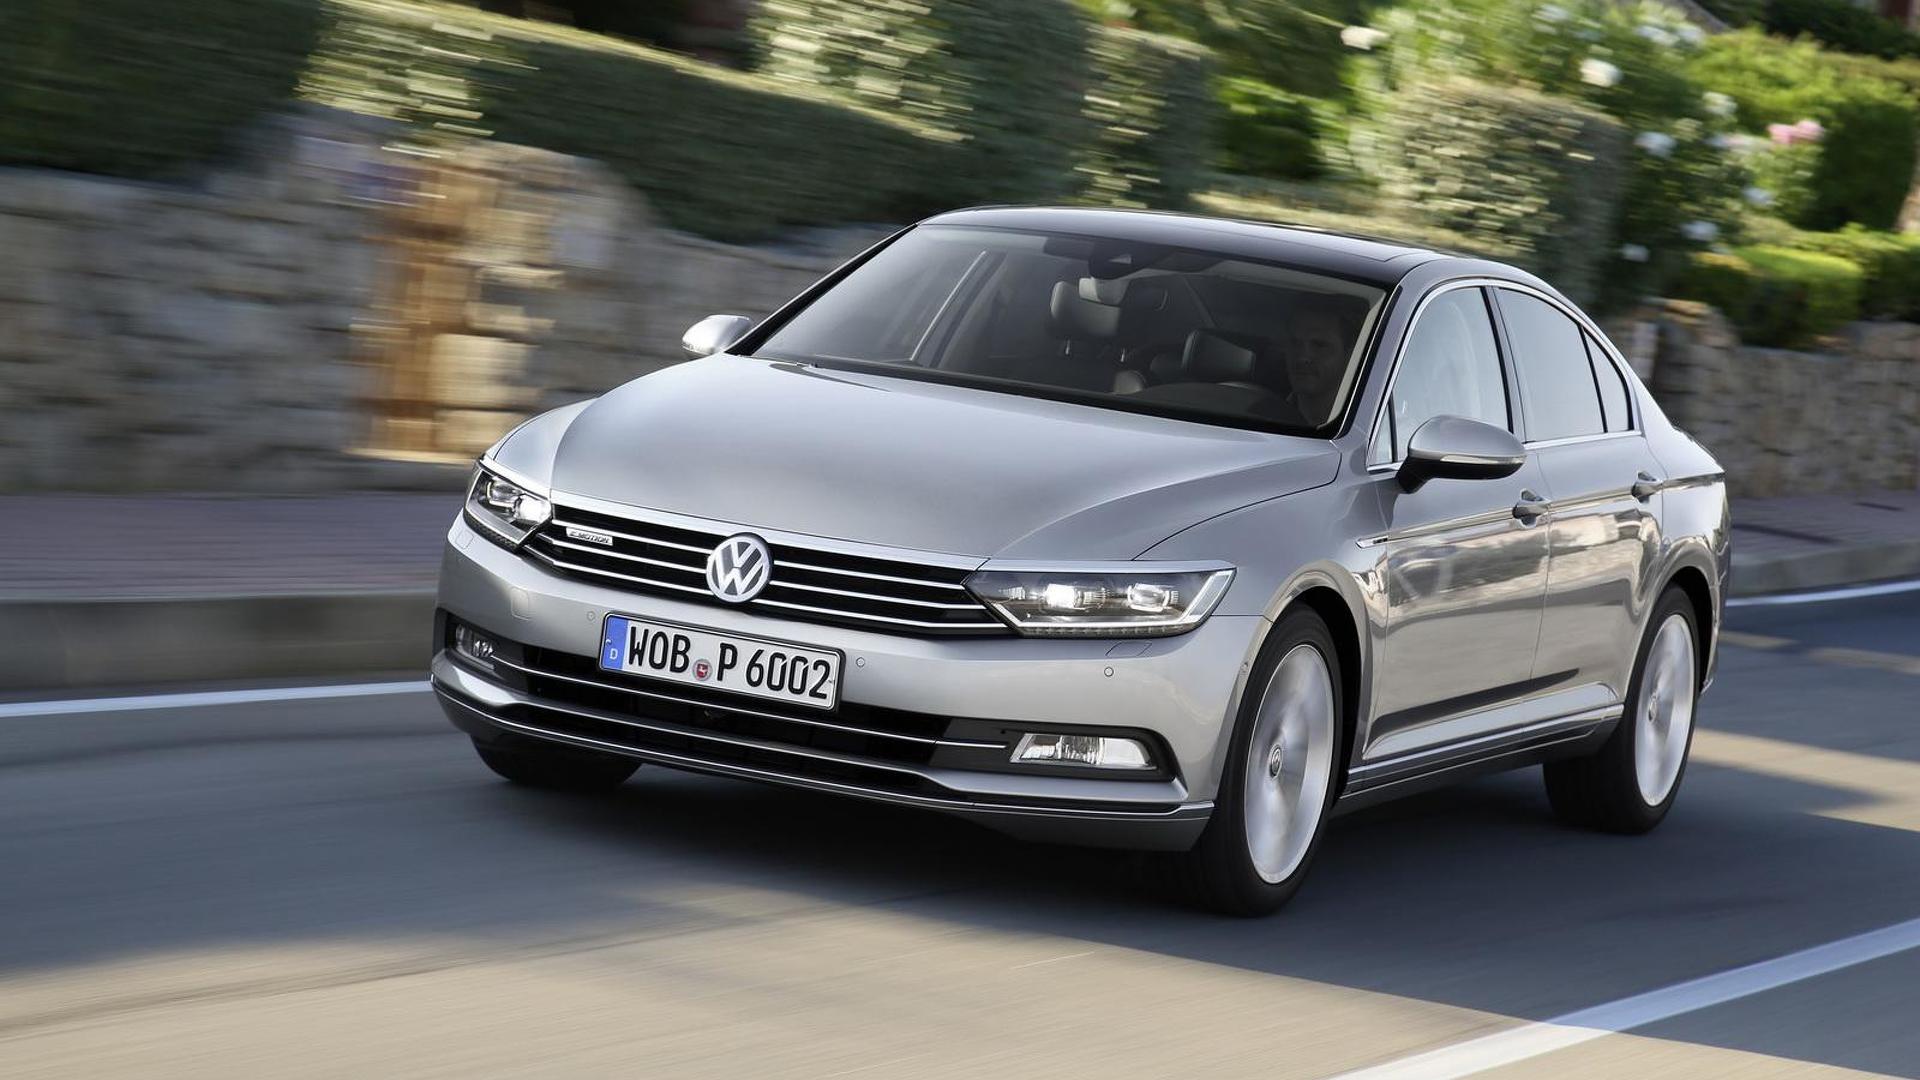 Volkswagen identifies CO2 offenders from Audi, Seat, Skoda and VW